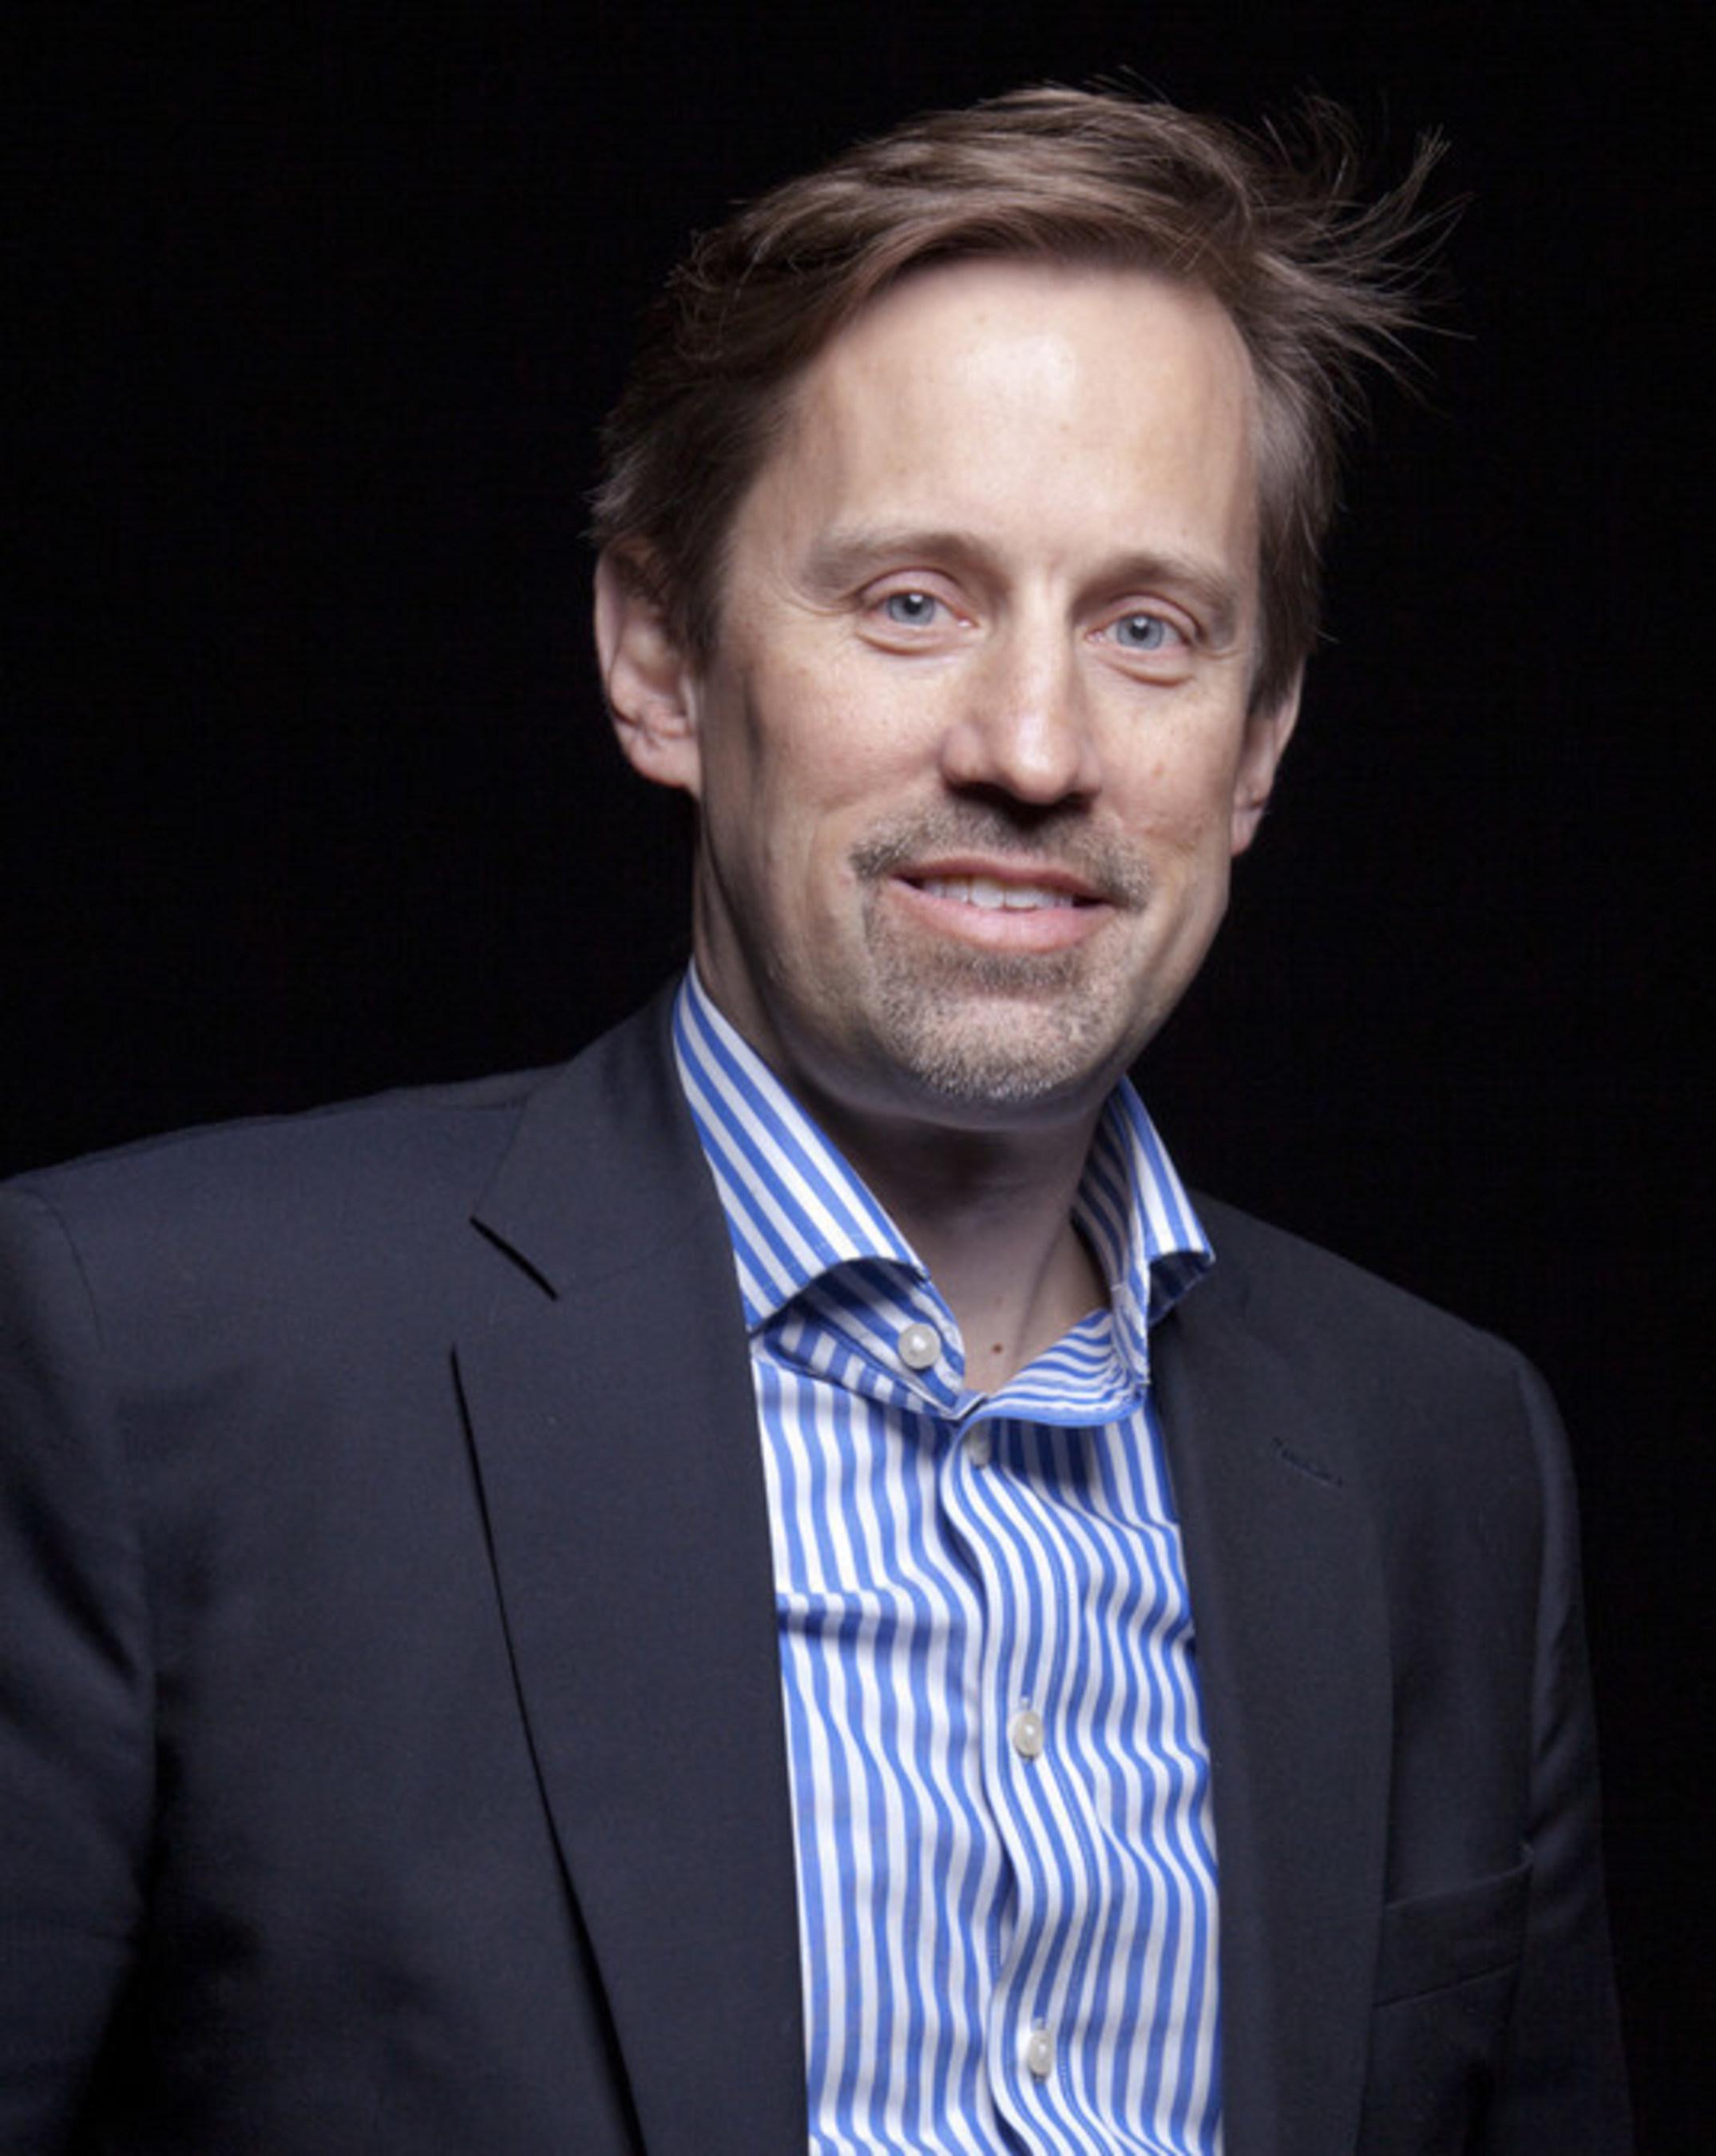 Dr. David Tuveson, Director, CSHL Cancer Center